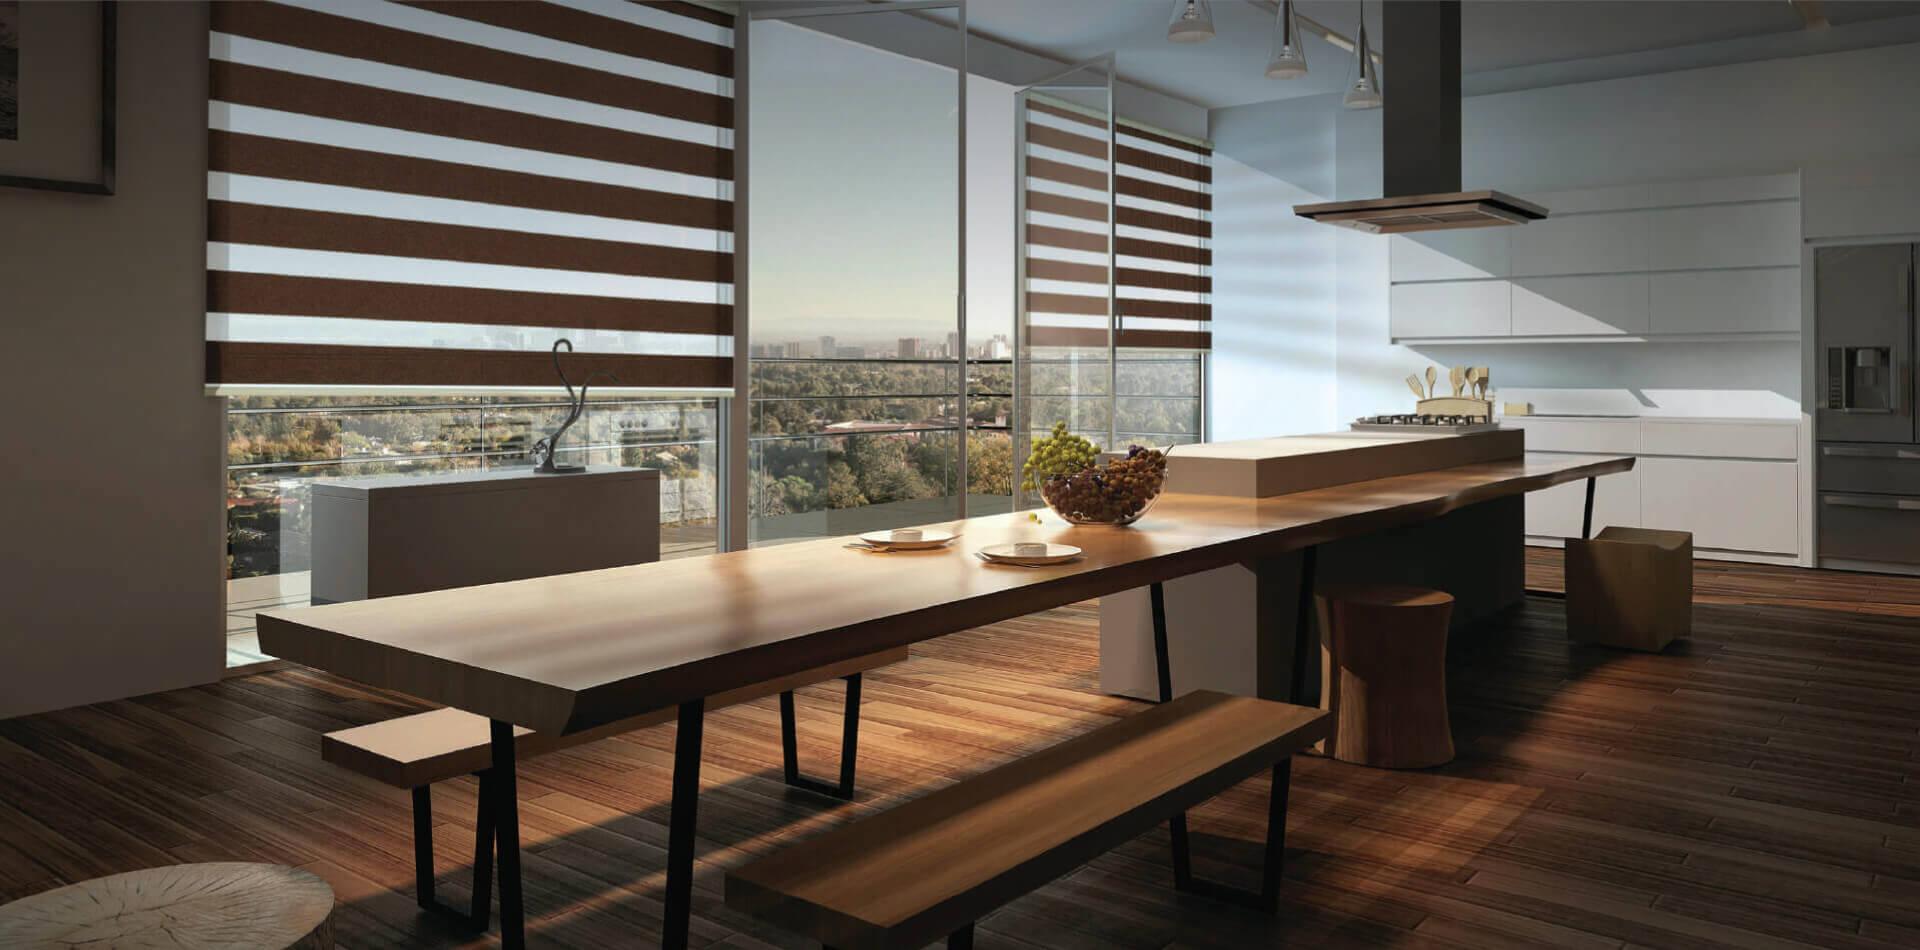 A dining room design